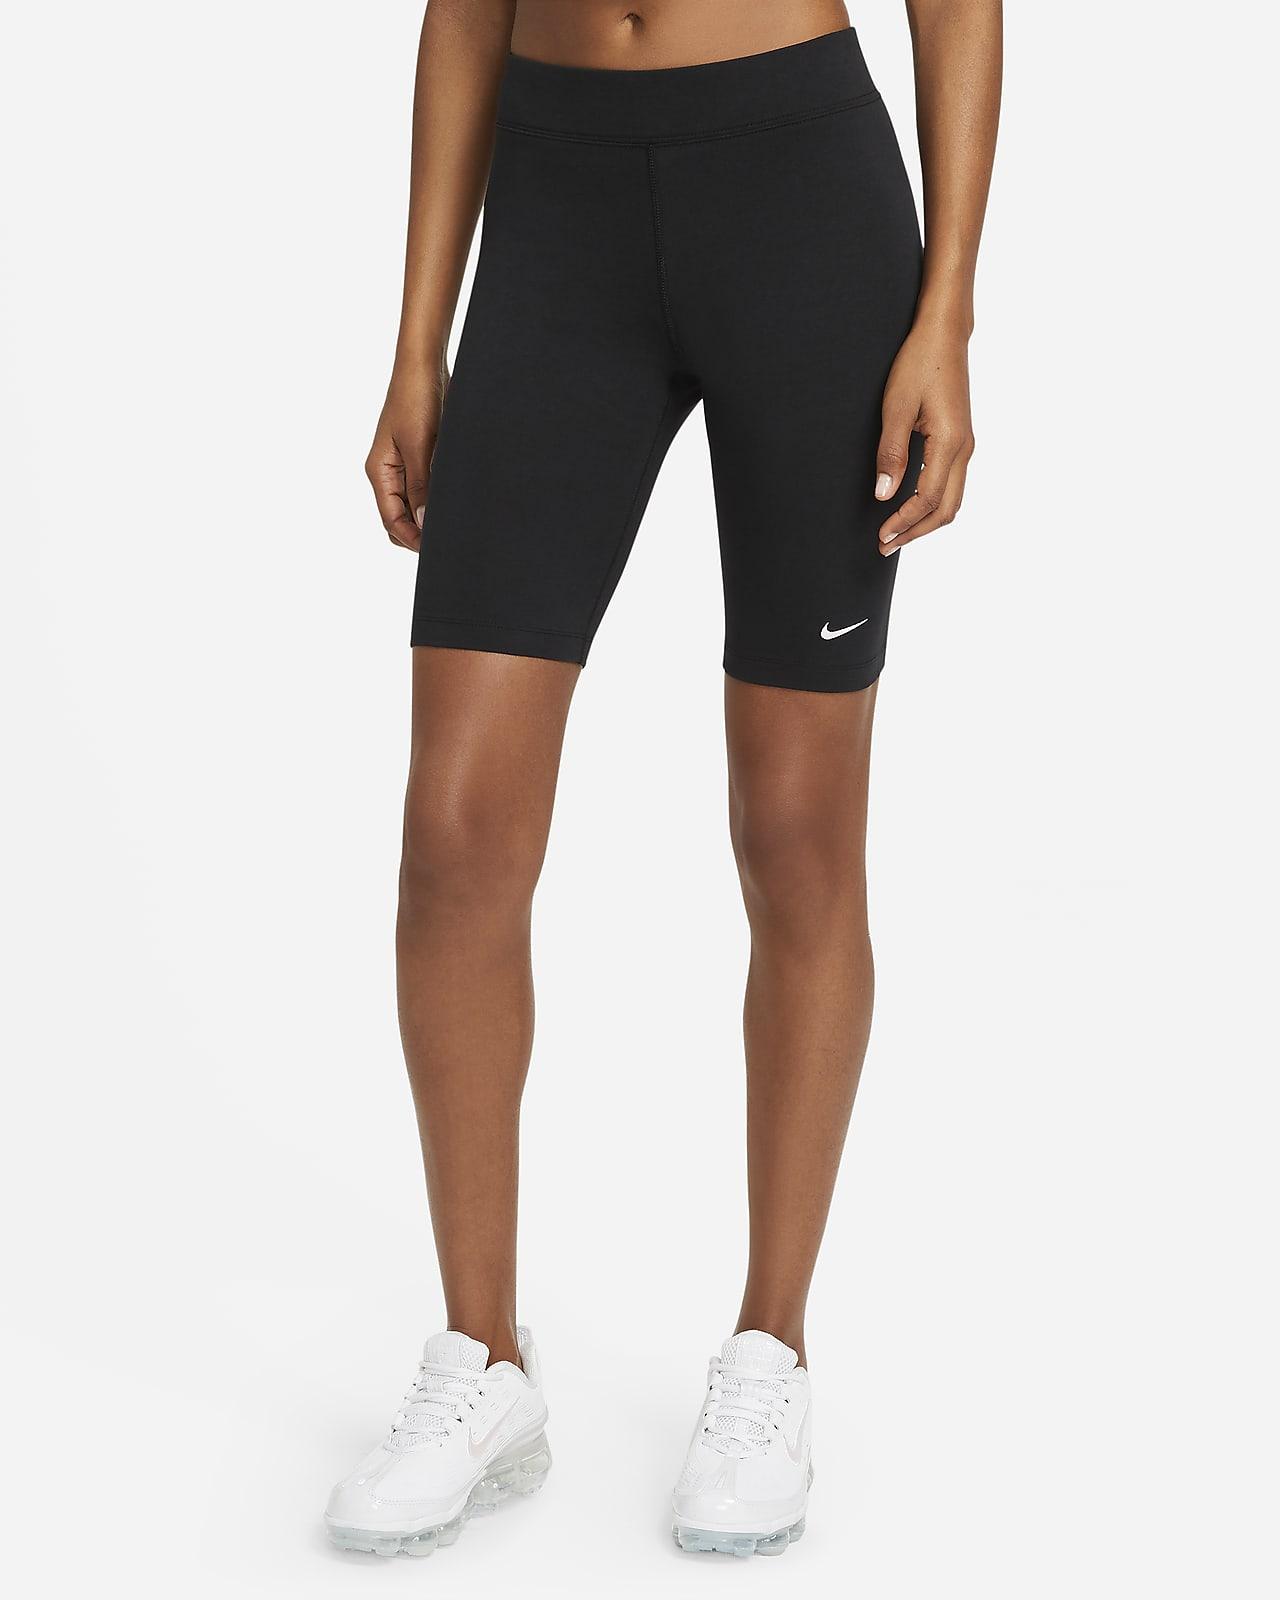 Dámské cyklistické kraťasy Nike Sportswear Essential